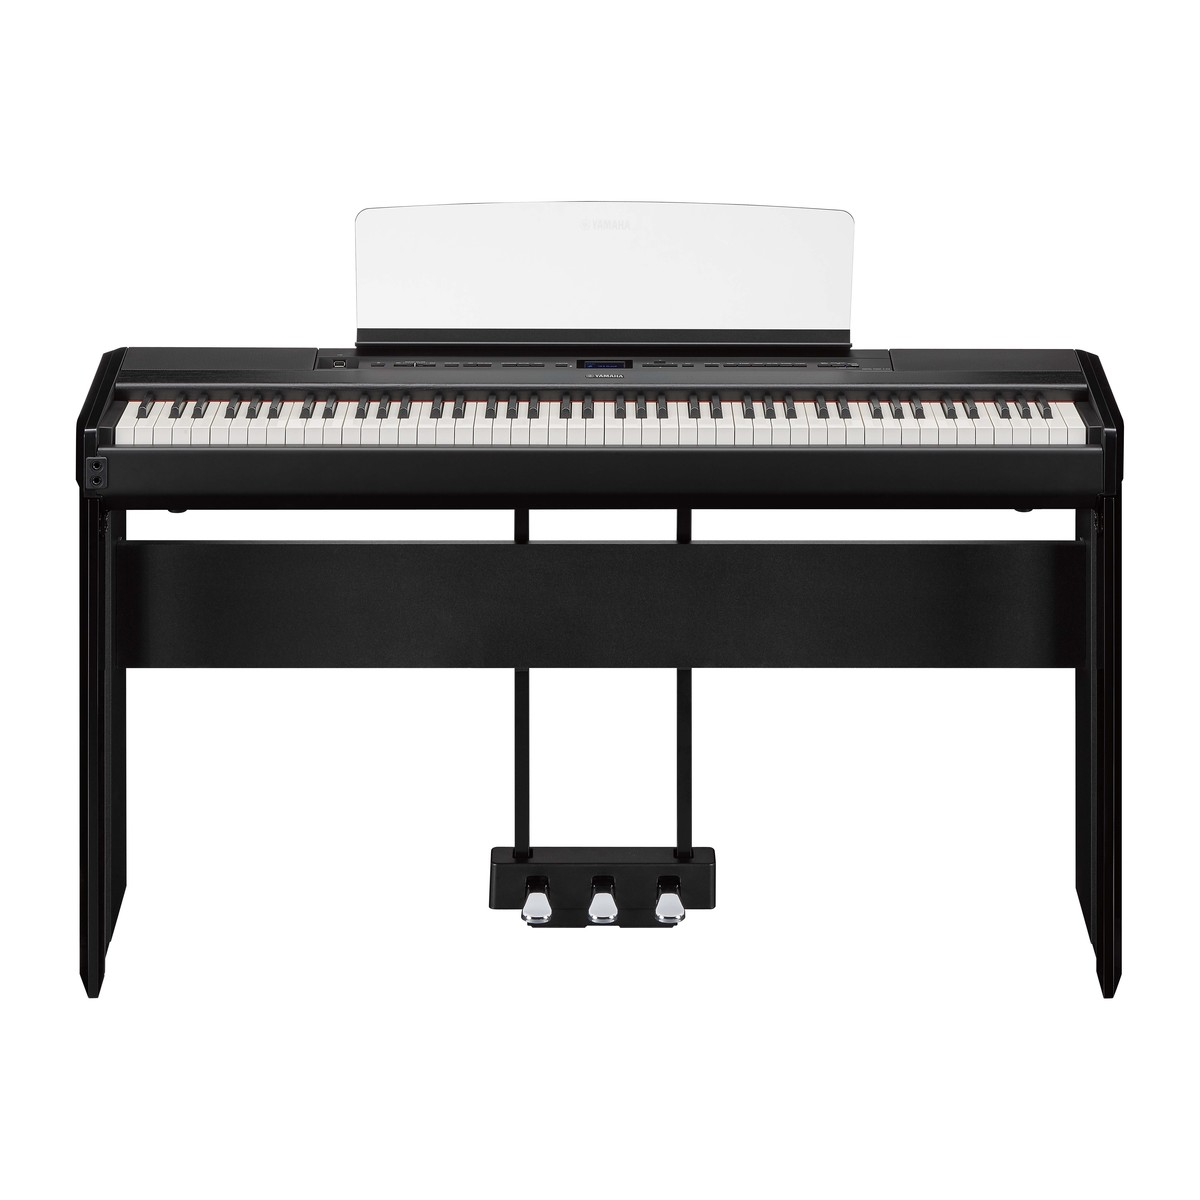 Yamaha P-515 klaviatura s podstavkom in pedali